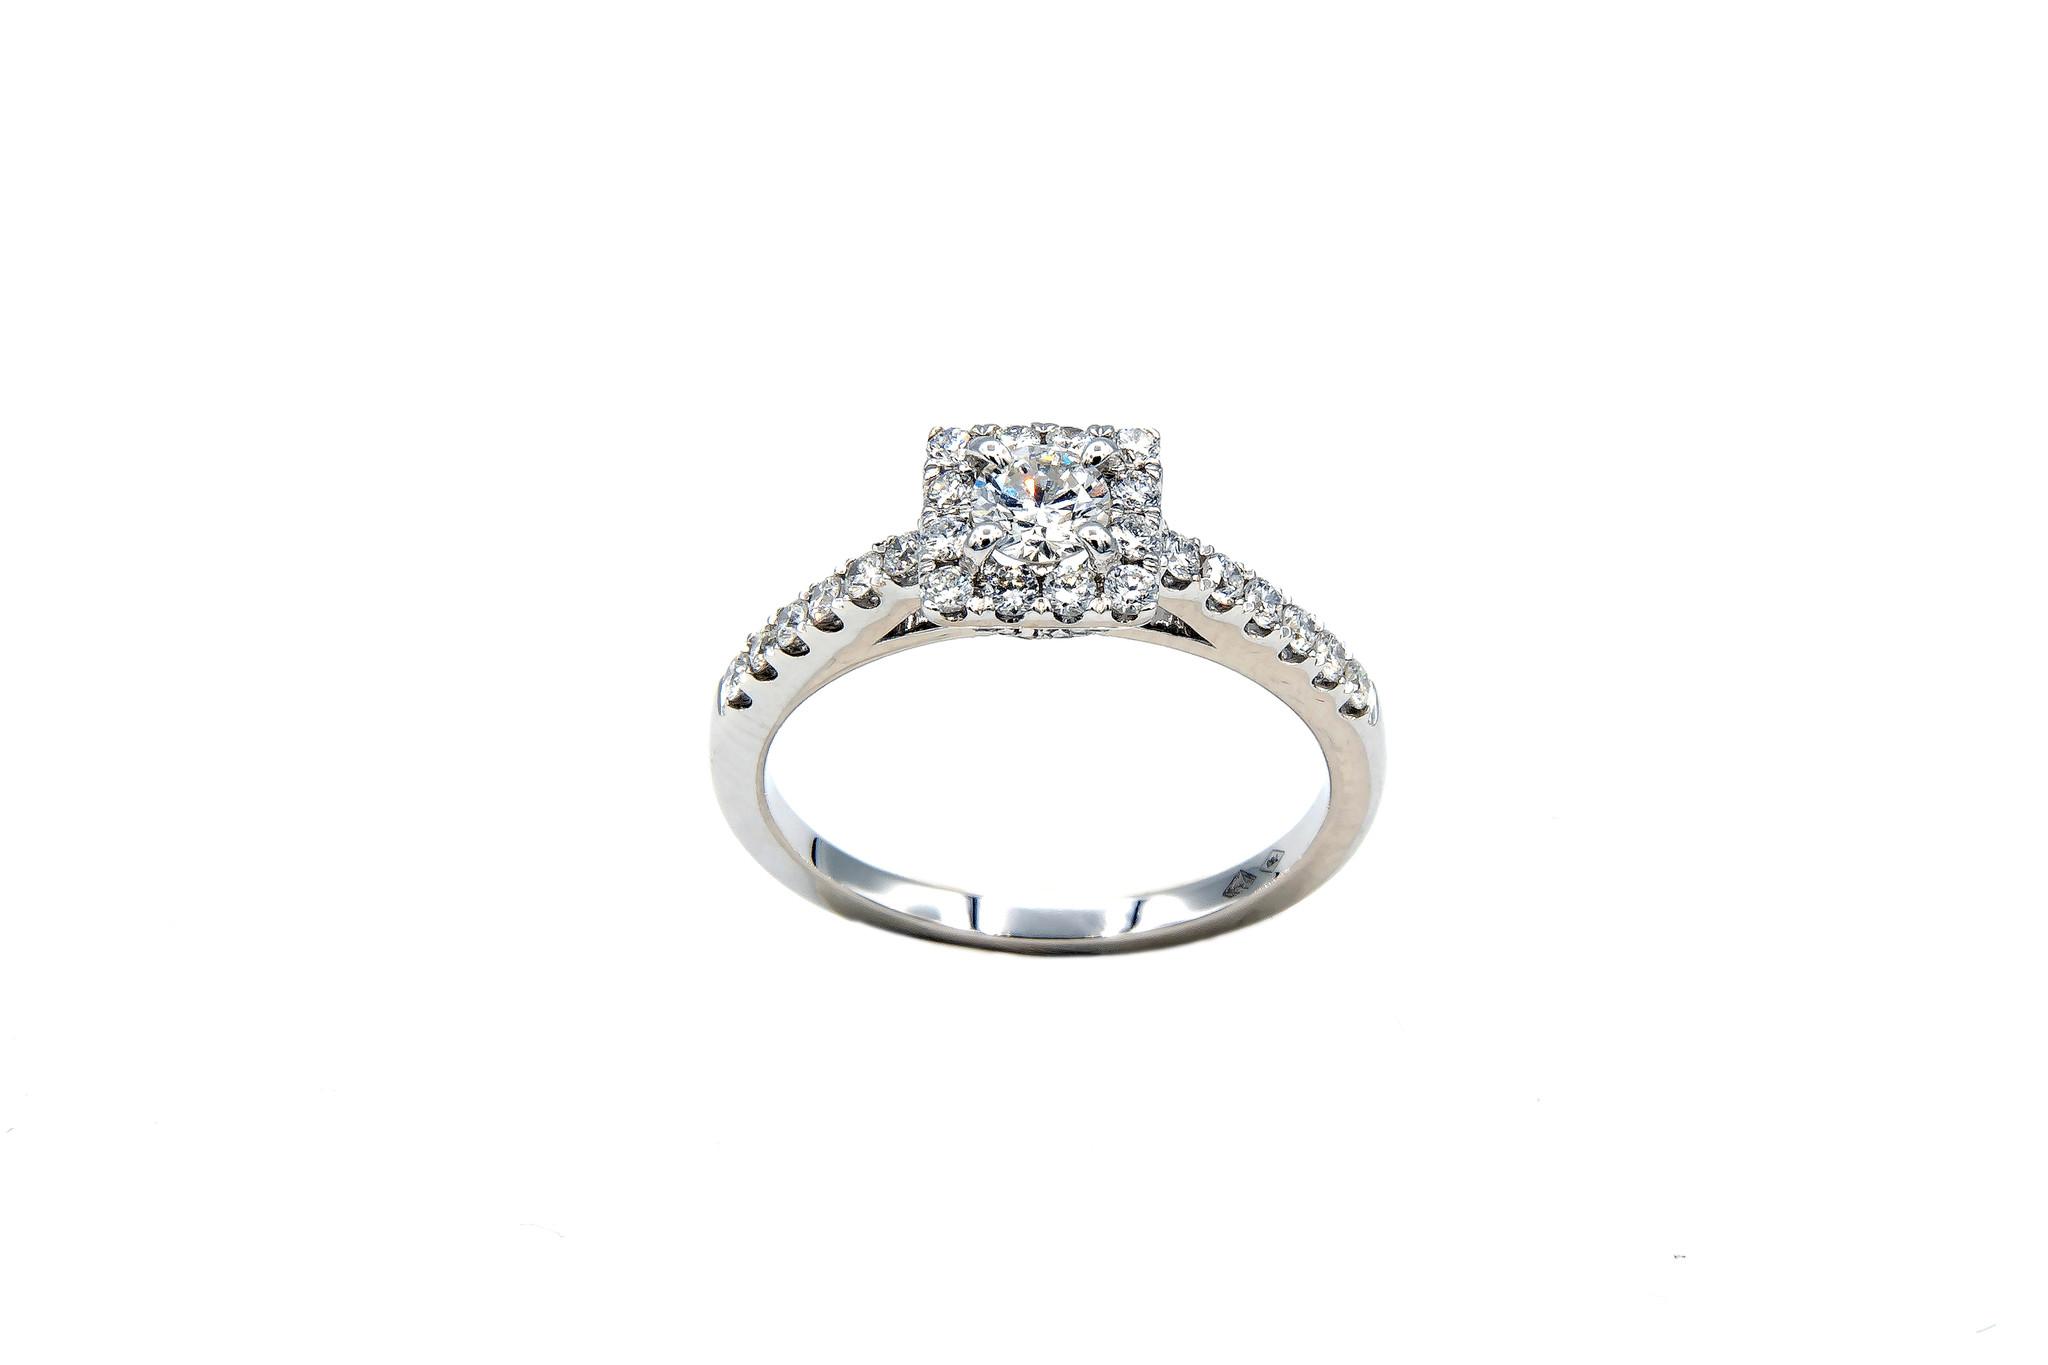 Ring verlovingsring witgoud met 0,2 ct SI en 0,28 ct VS diamant-6